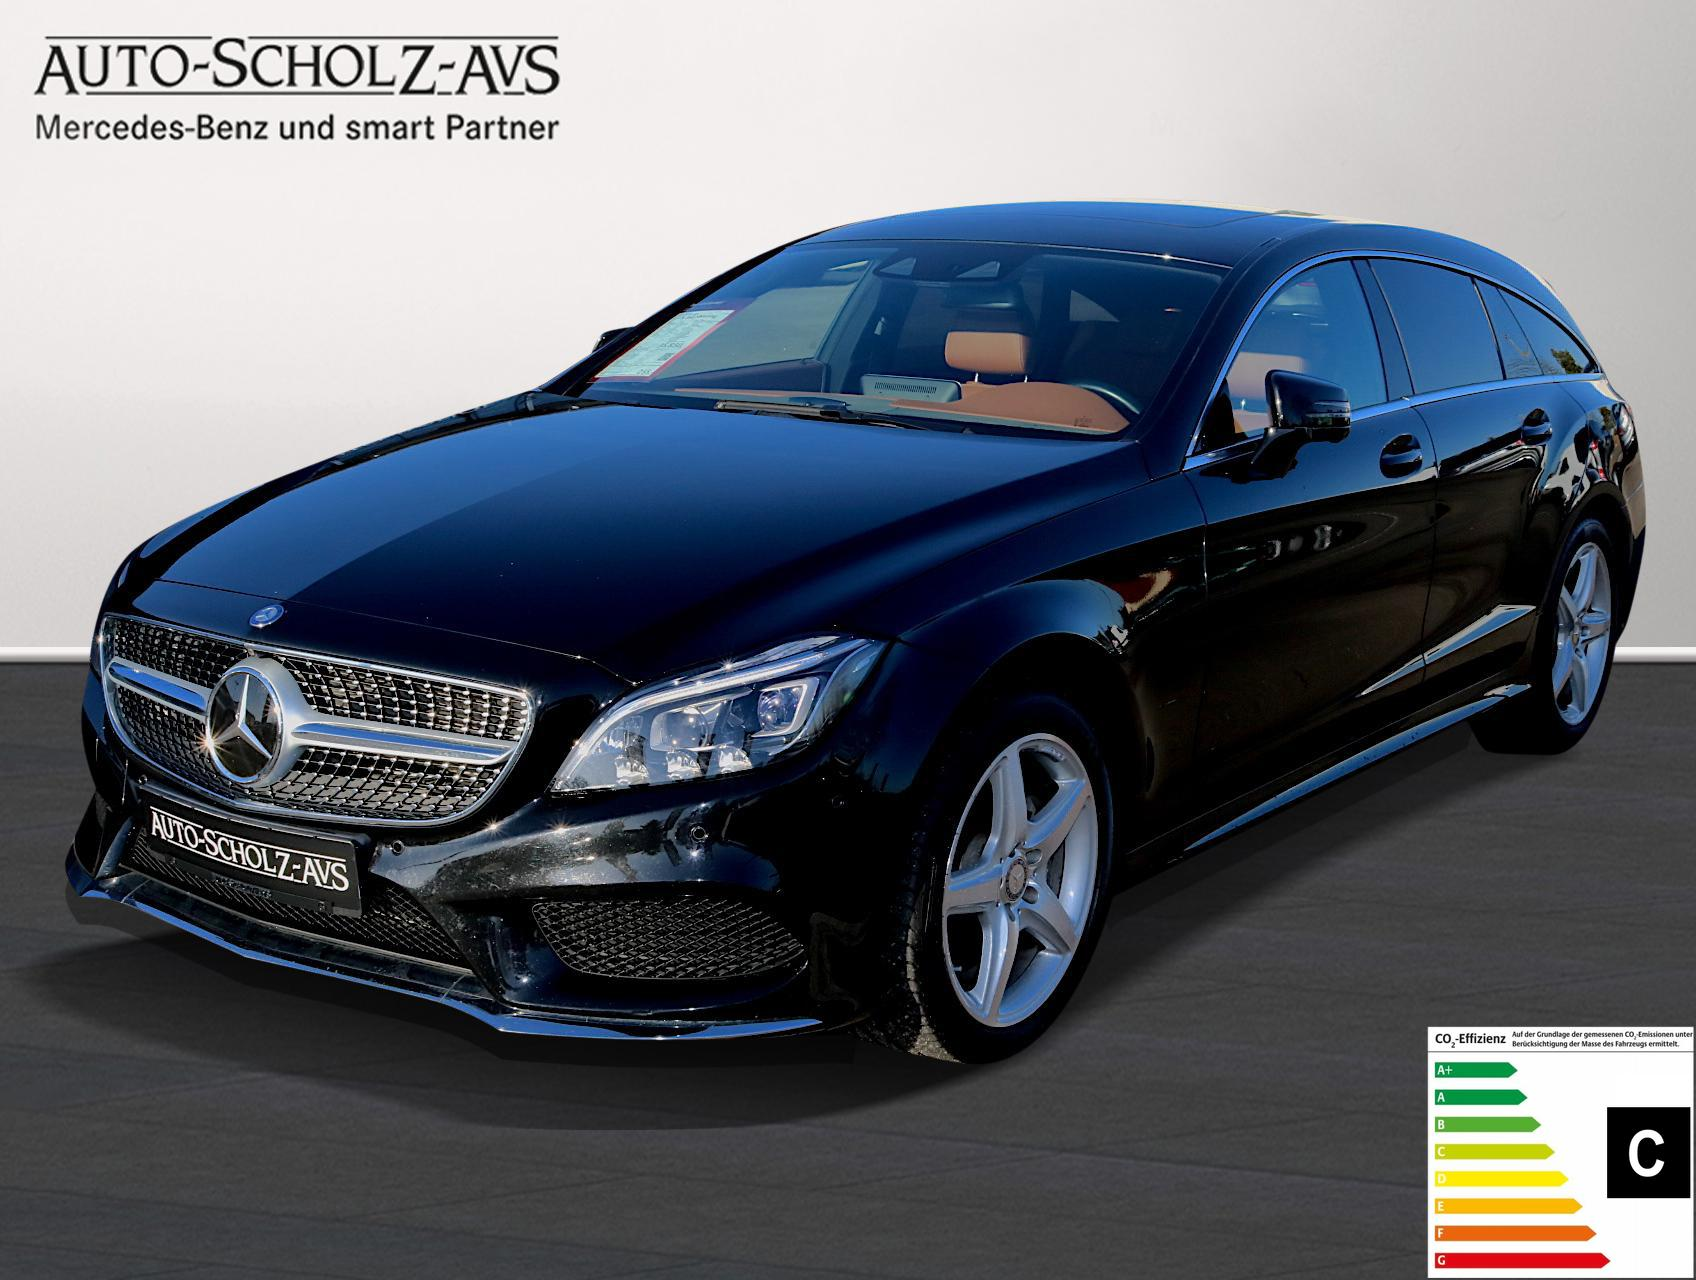 Mercedes-Benz CLS 350 Shooting Brake BlueTEC 4MATIC*AMG*LED, Jahr 2015, Diesel